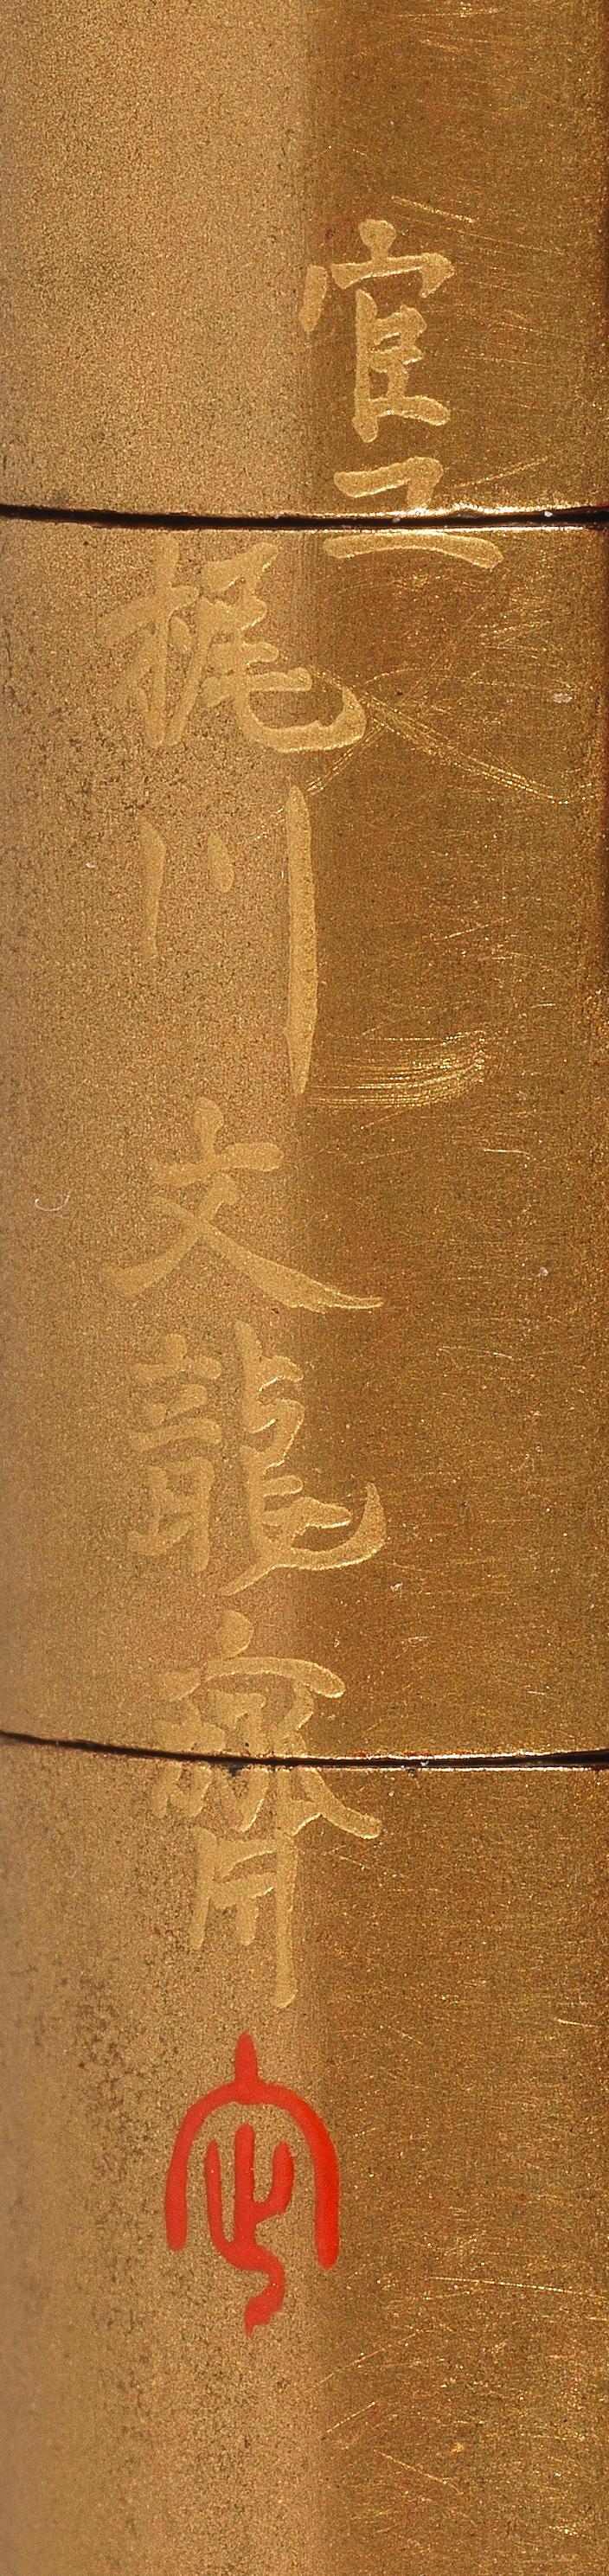 KAJIKAWA BUNRYŪSAI 梶川文龍斎 INRŌ WITH STRIPE DESIGN 縞模様蒔絵印籠 Edo period (1615–1868), 19th century